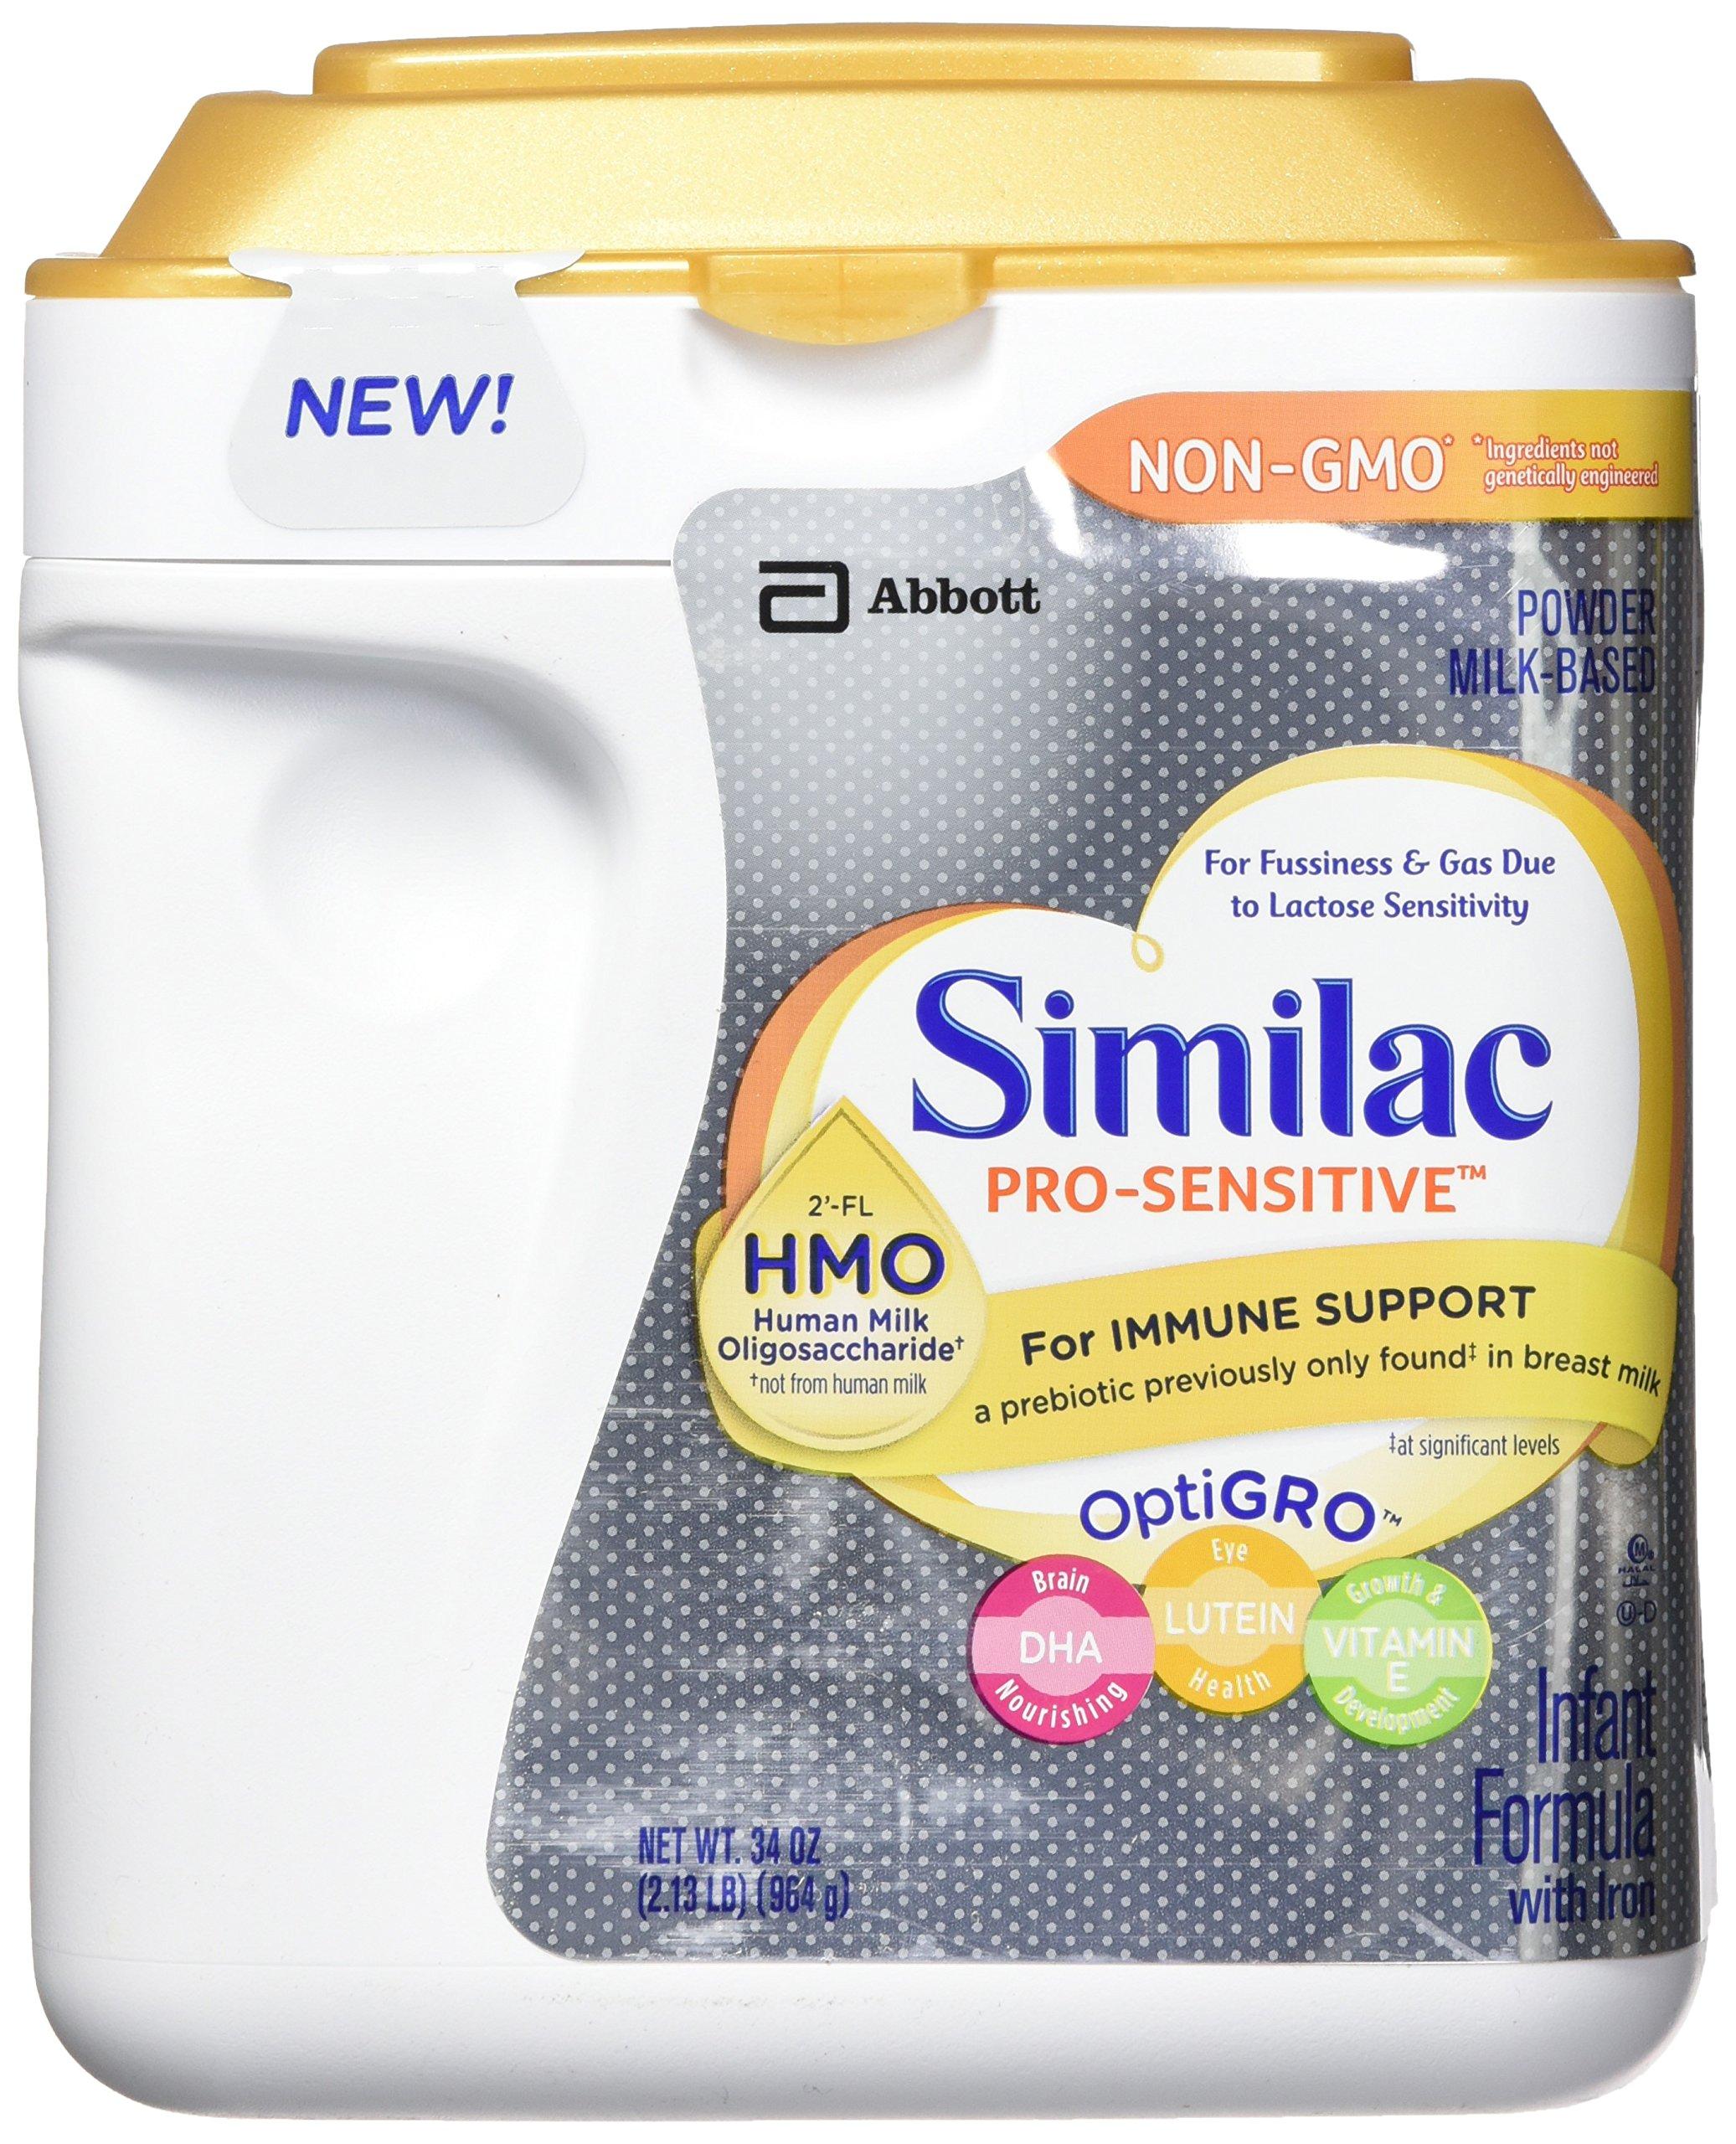 Similac Abbott Pro-Sensitive Non-GMO Powder Infant Formula with Iron with 2'-FL HMO for Immune Support 34 oz